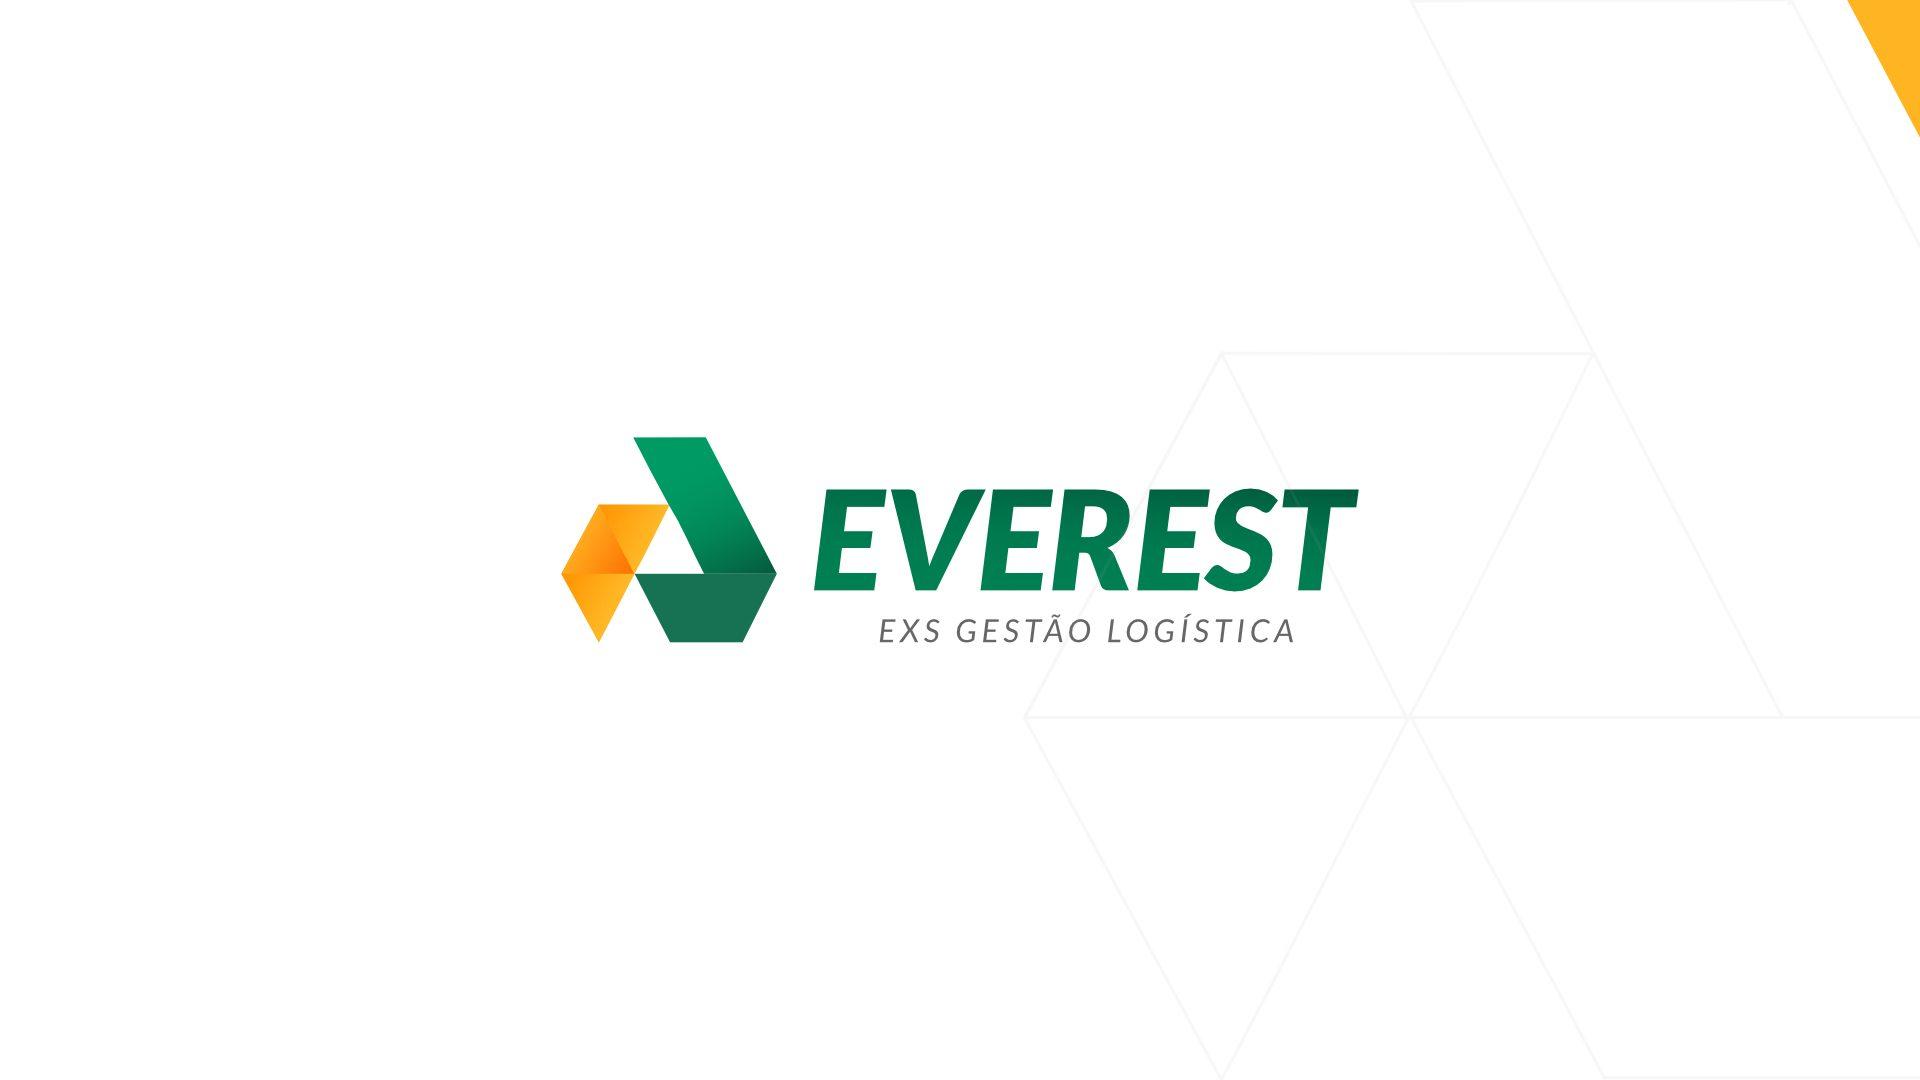 logo everest 2019 cliente